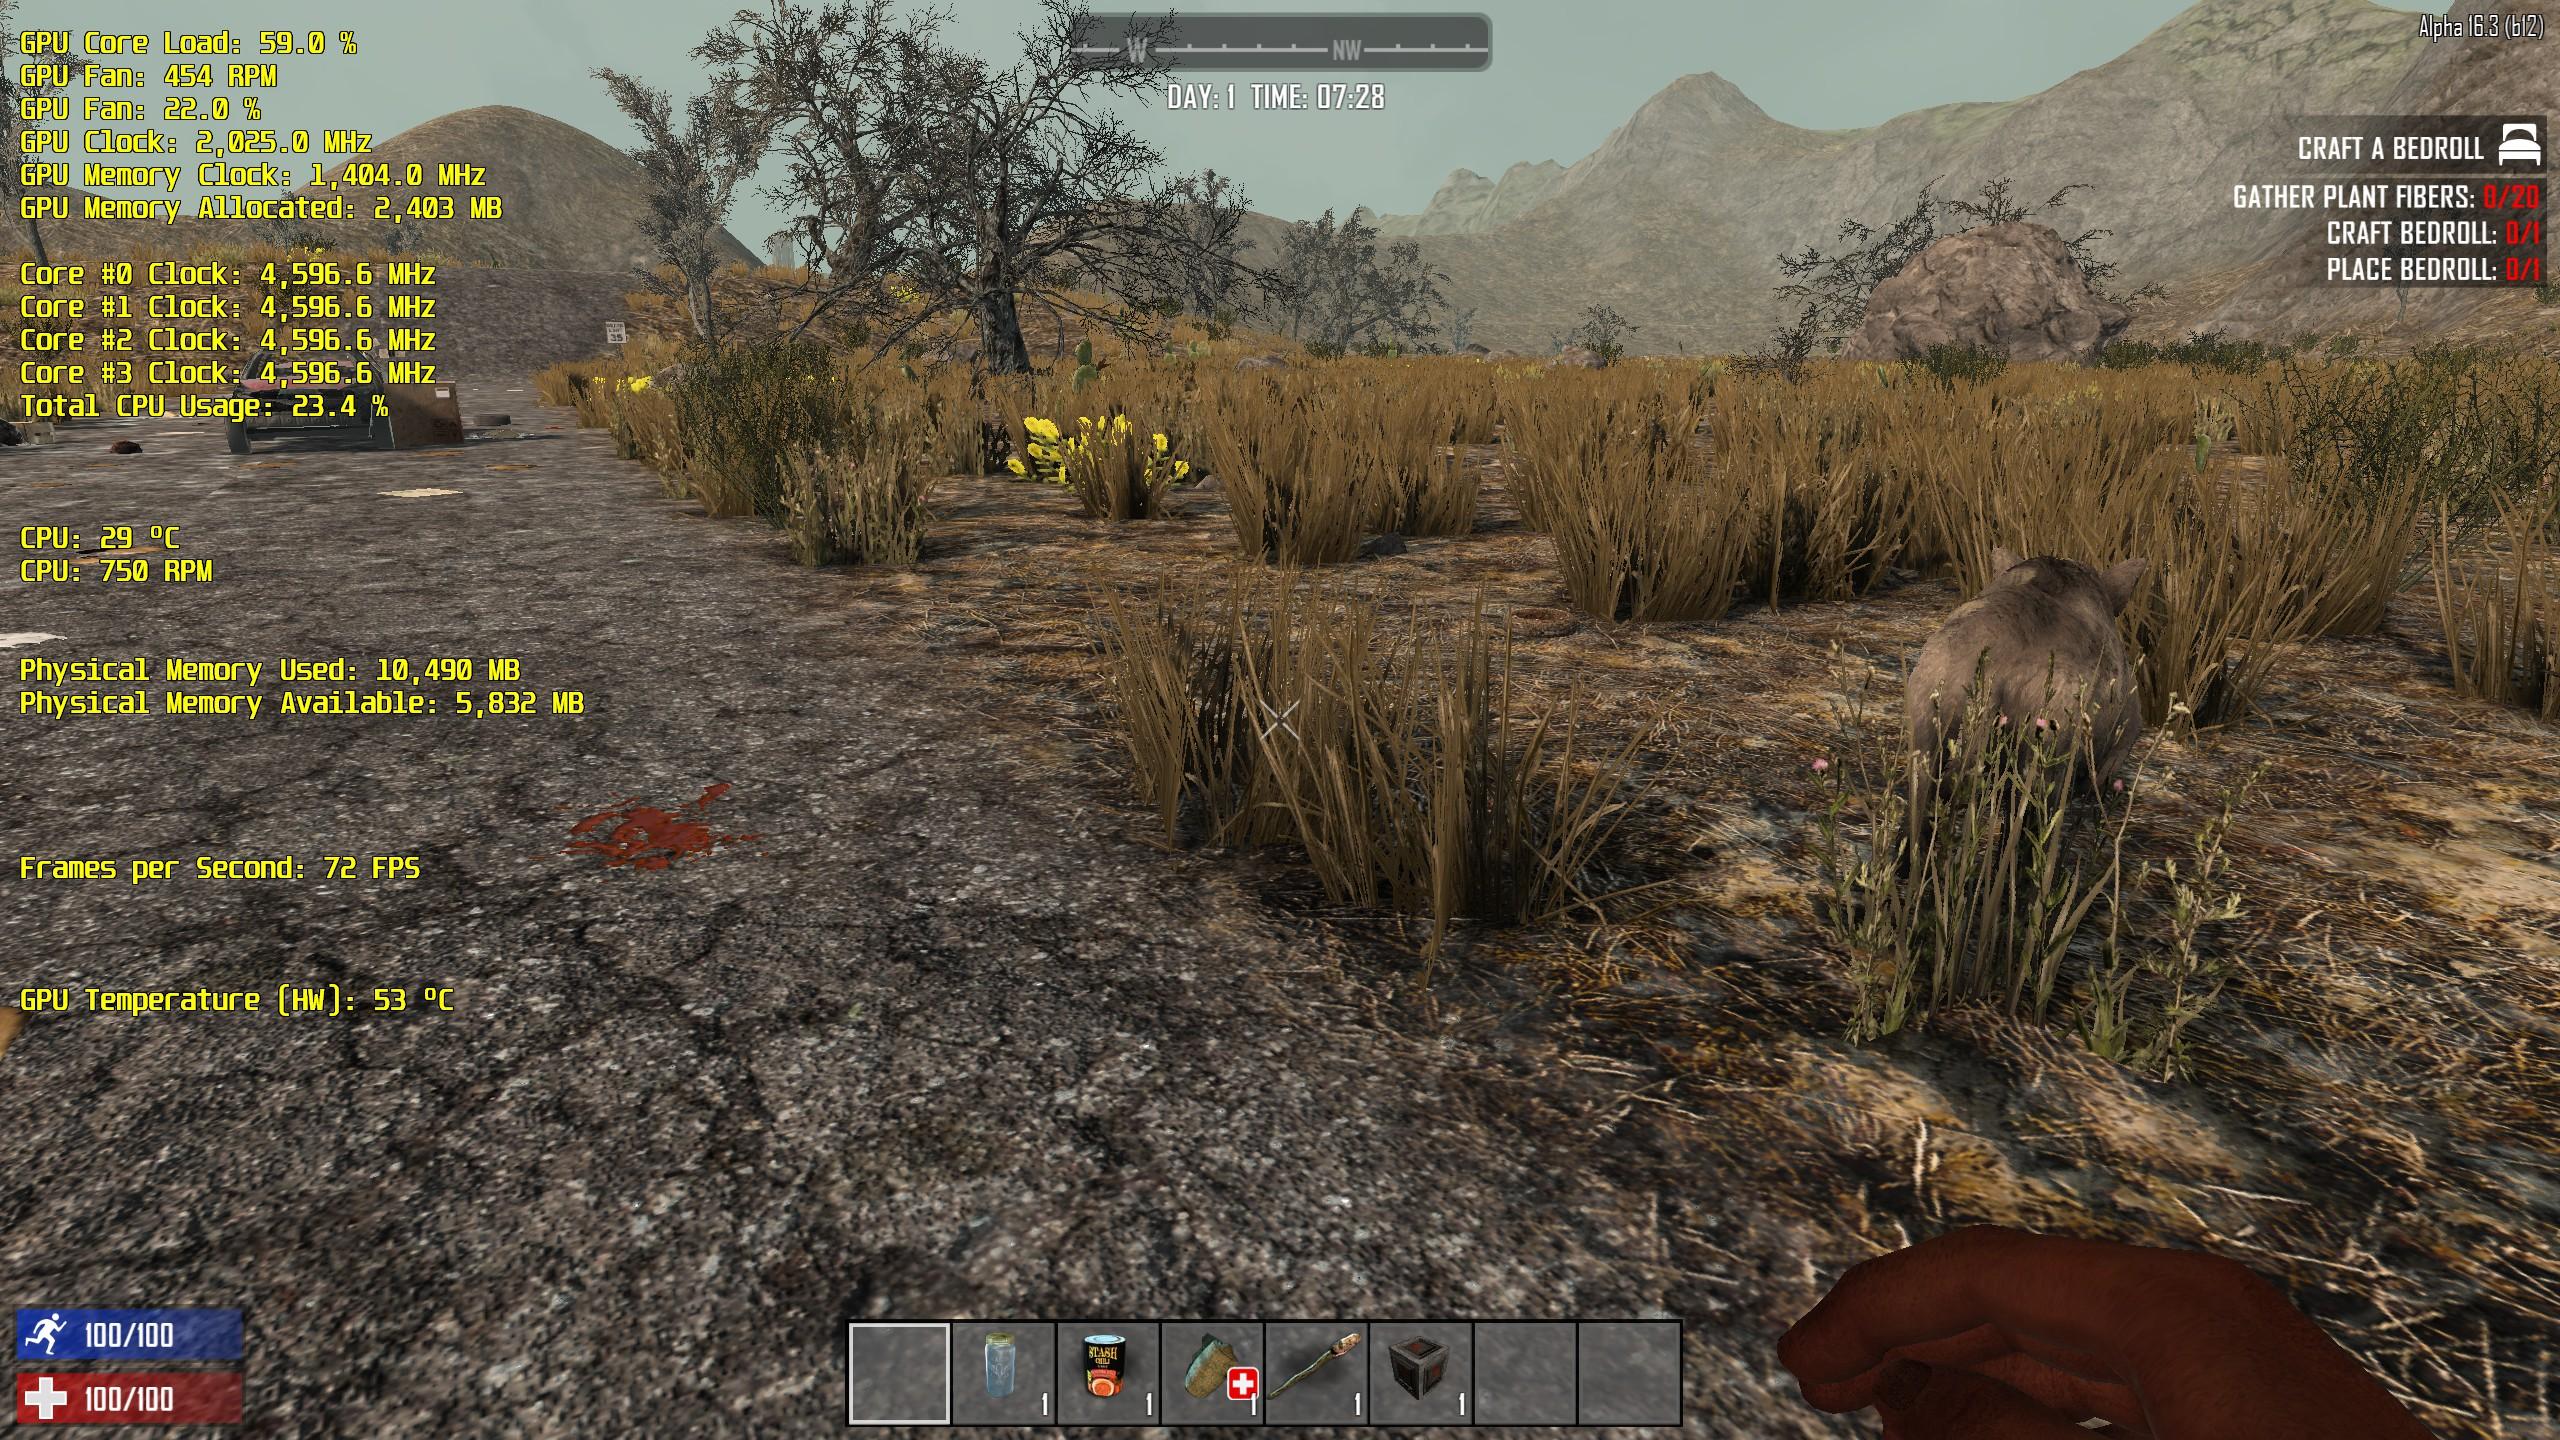 Steam Community :: Screenshot :: 1080Ti 7D2D Voxel based game